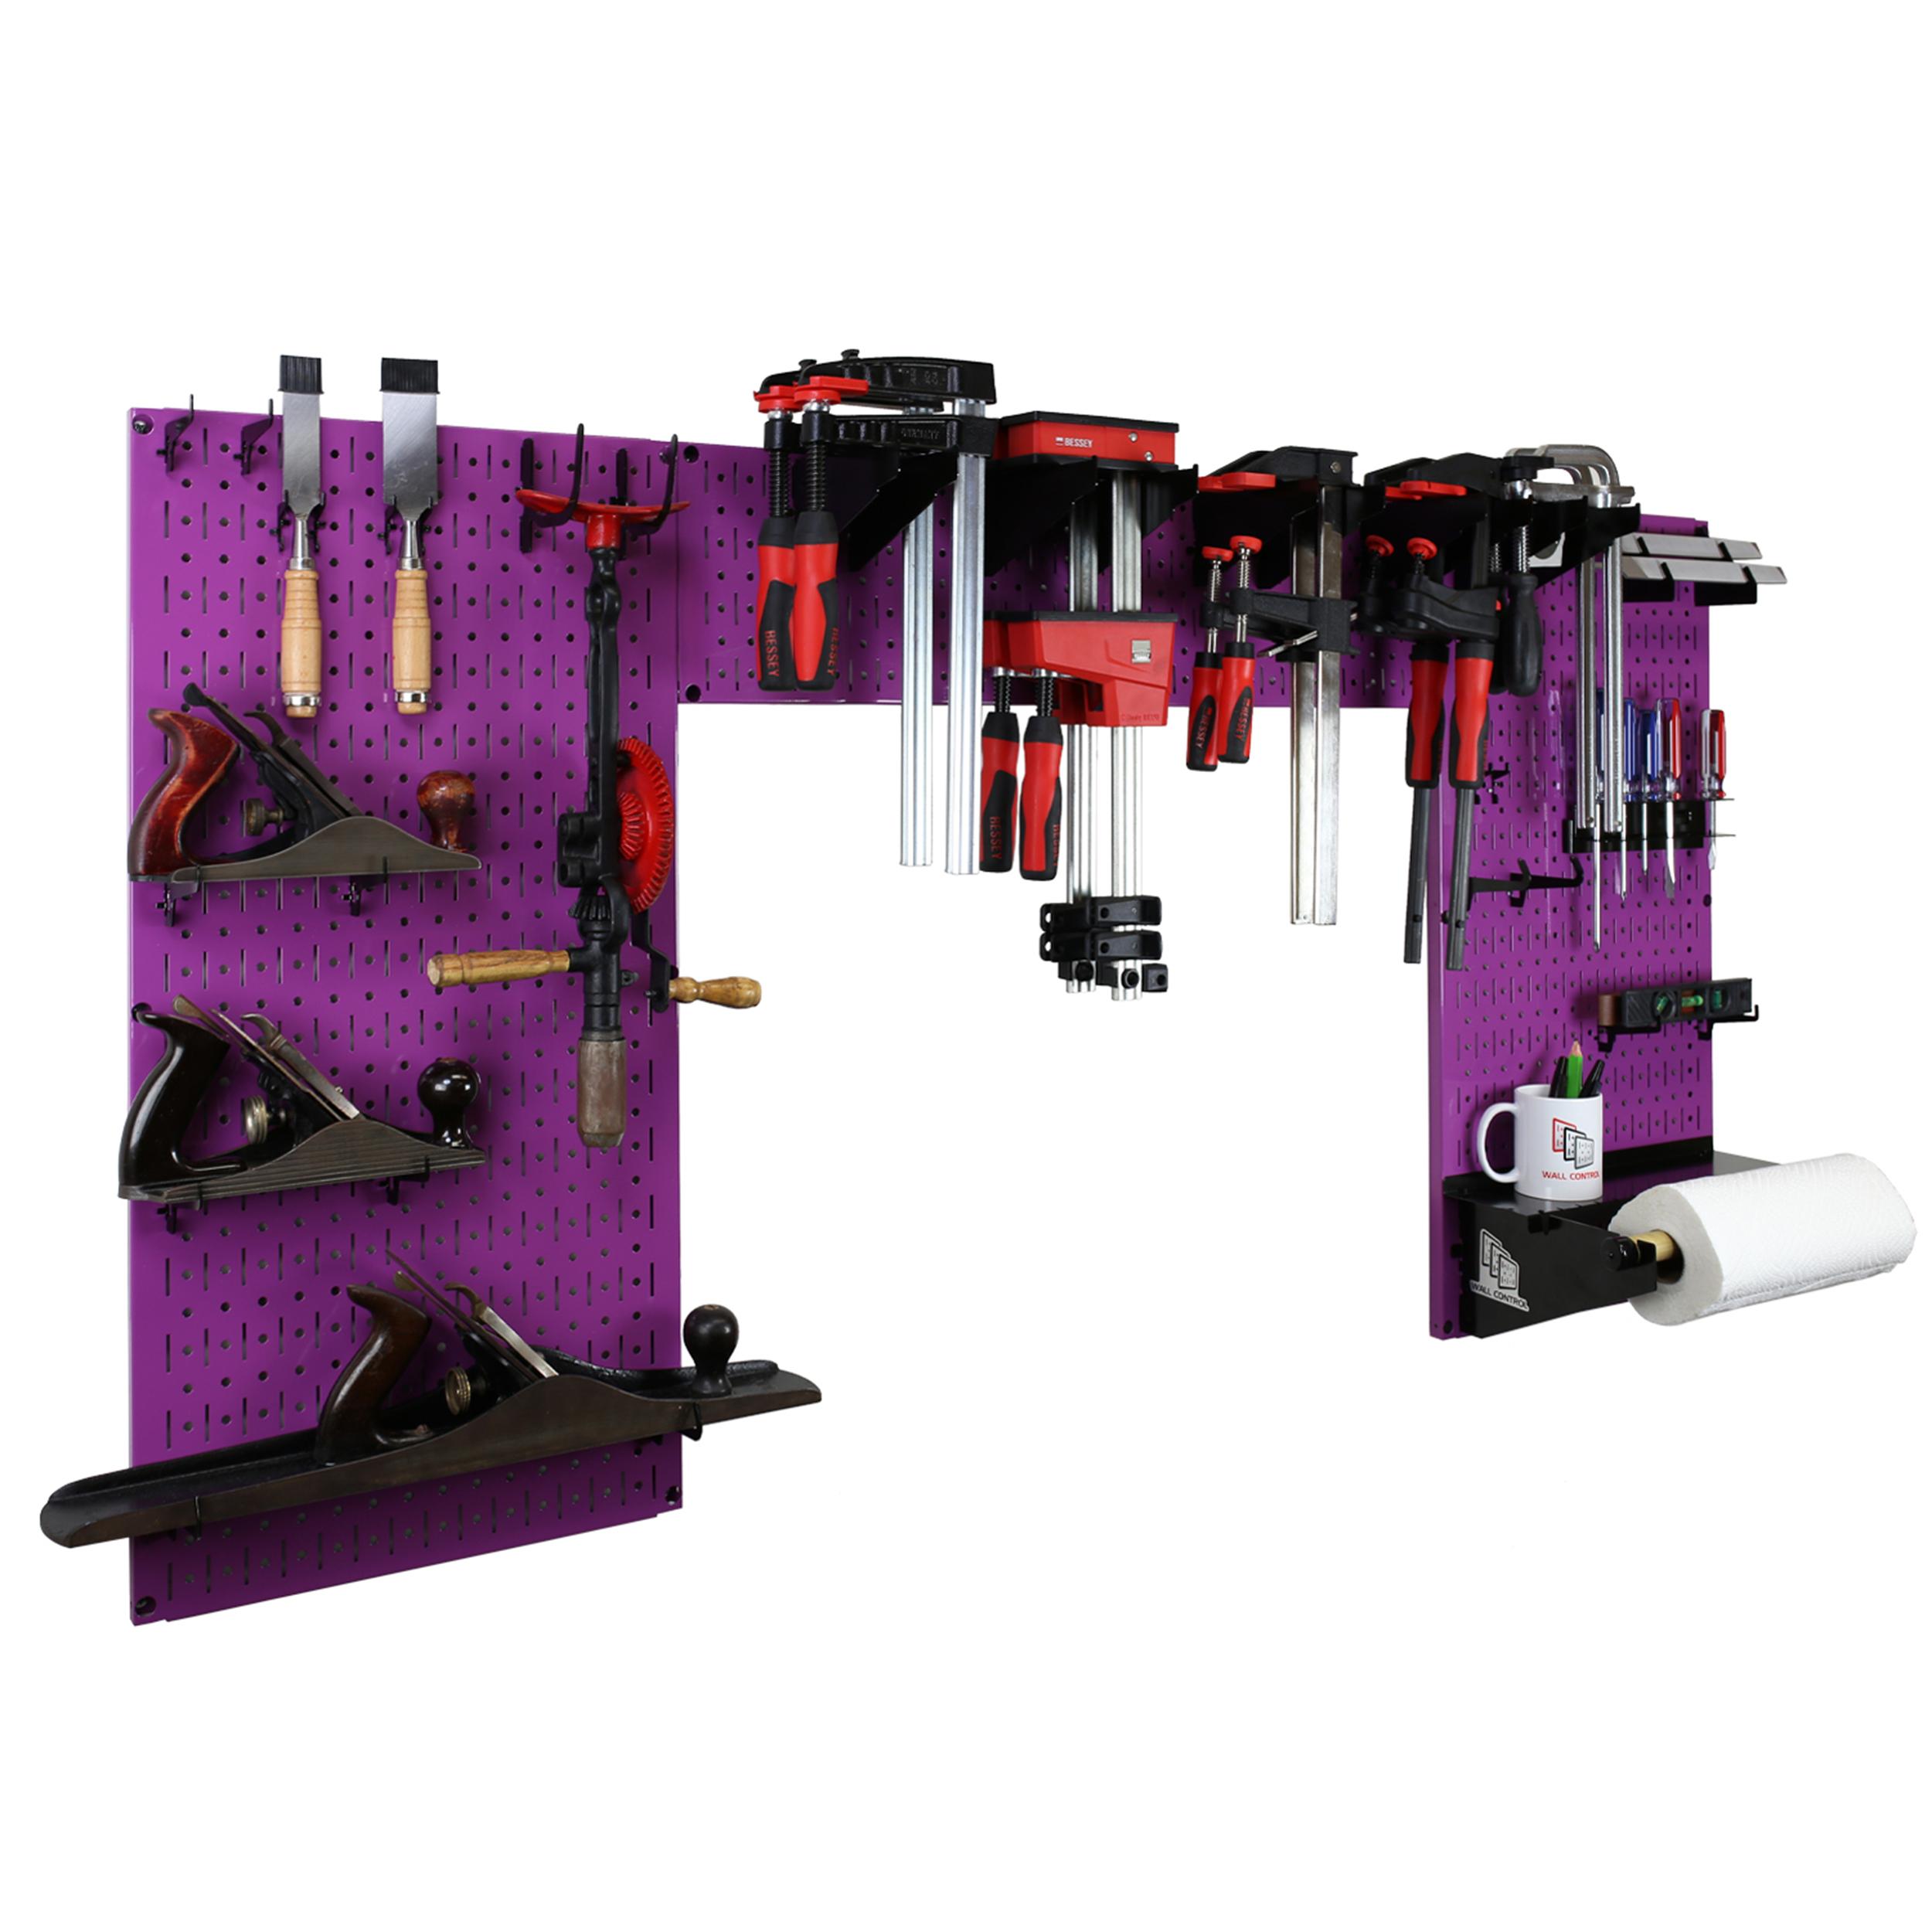 Lazy Guy DIY Maker Woodworking Tool Storage Organizer Set, Purple